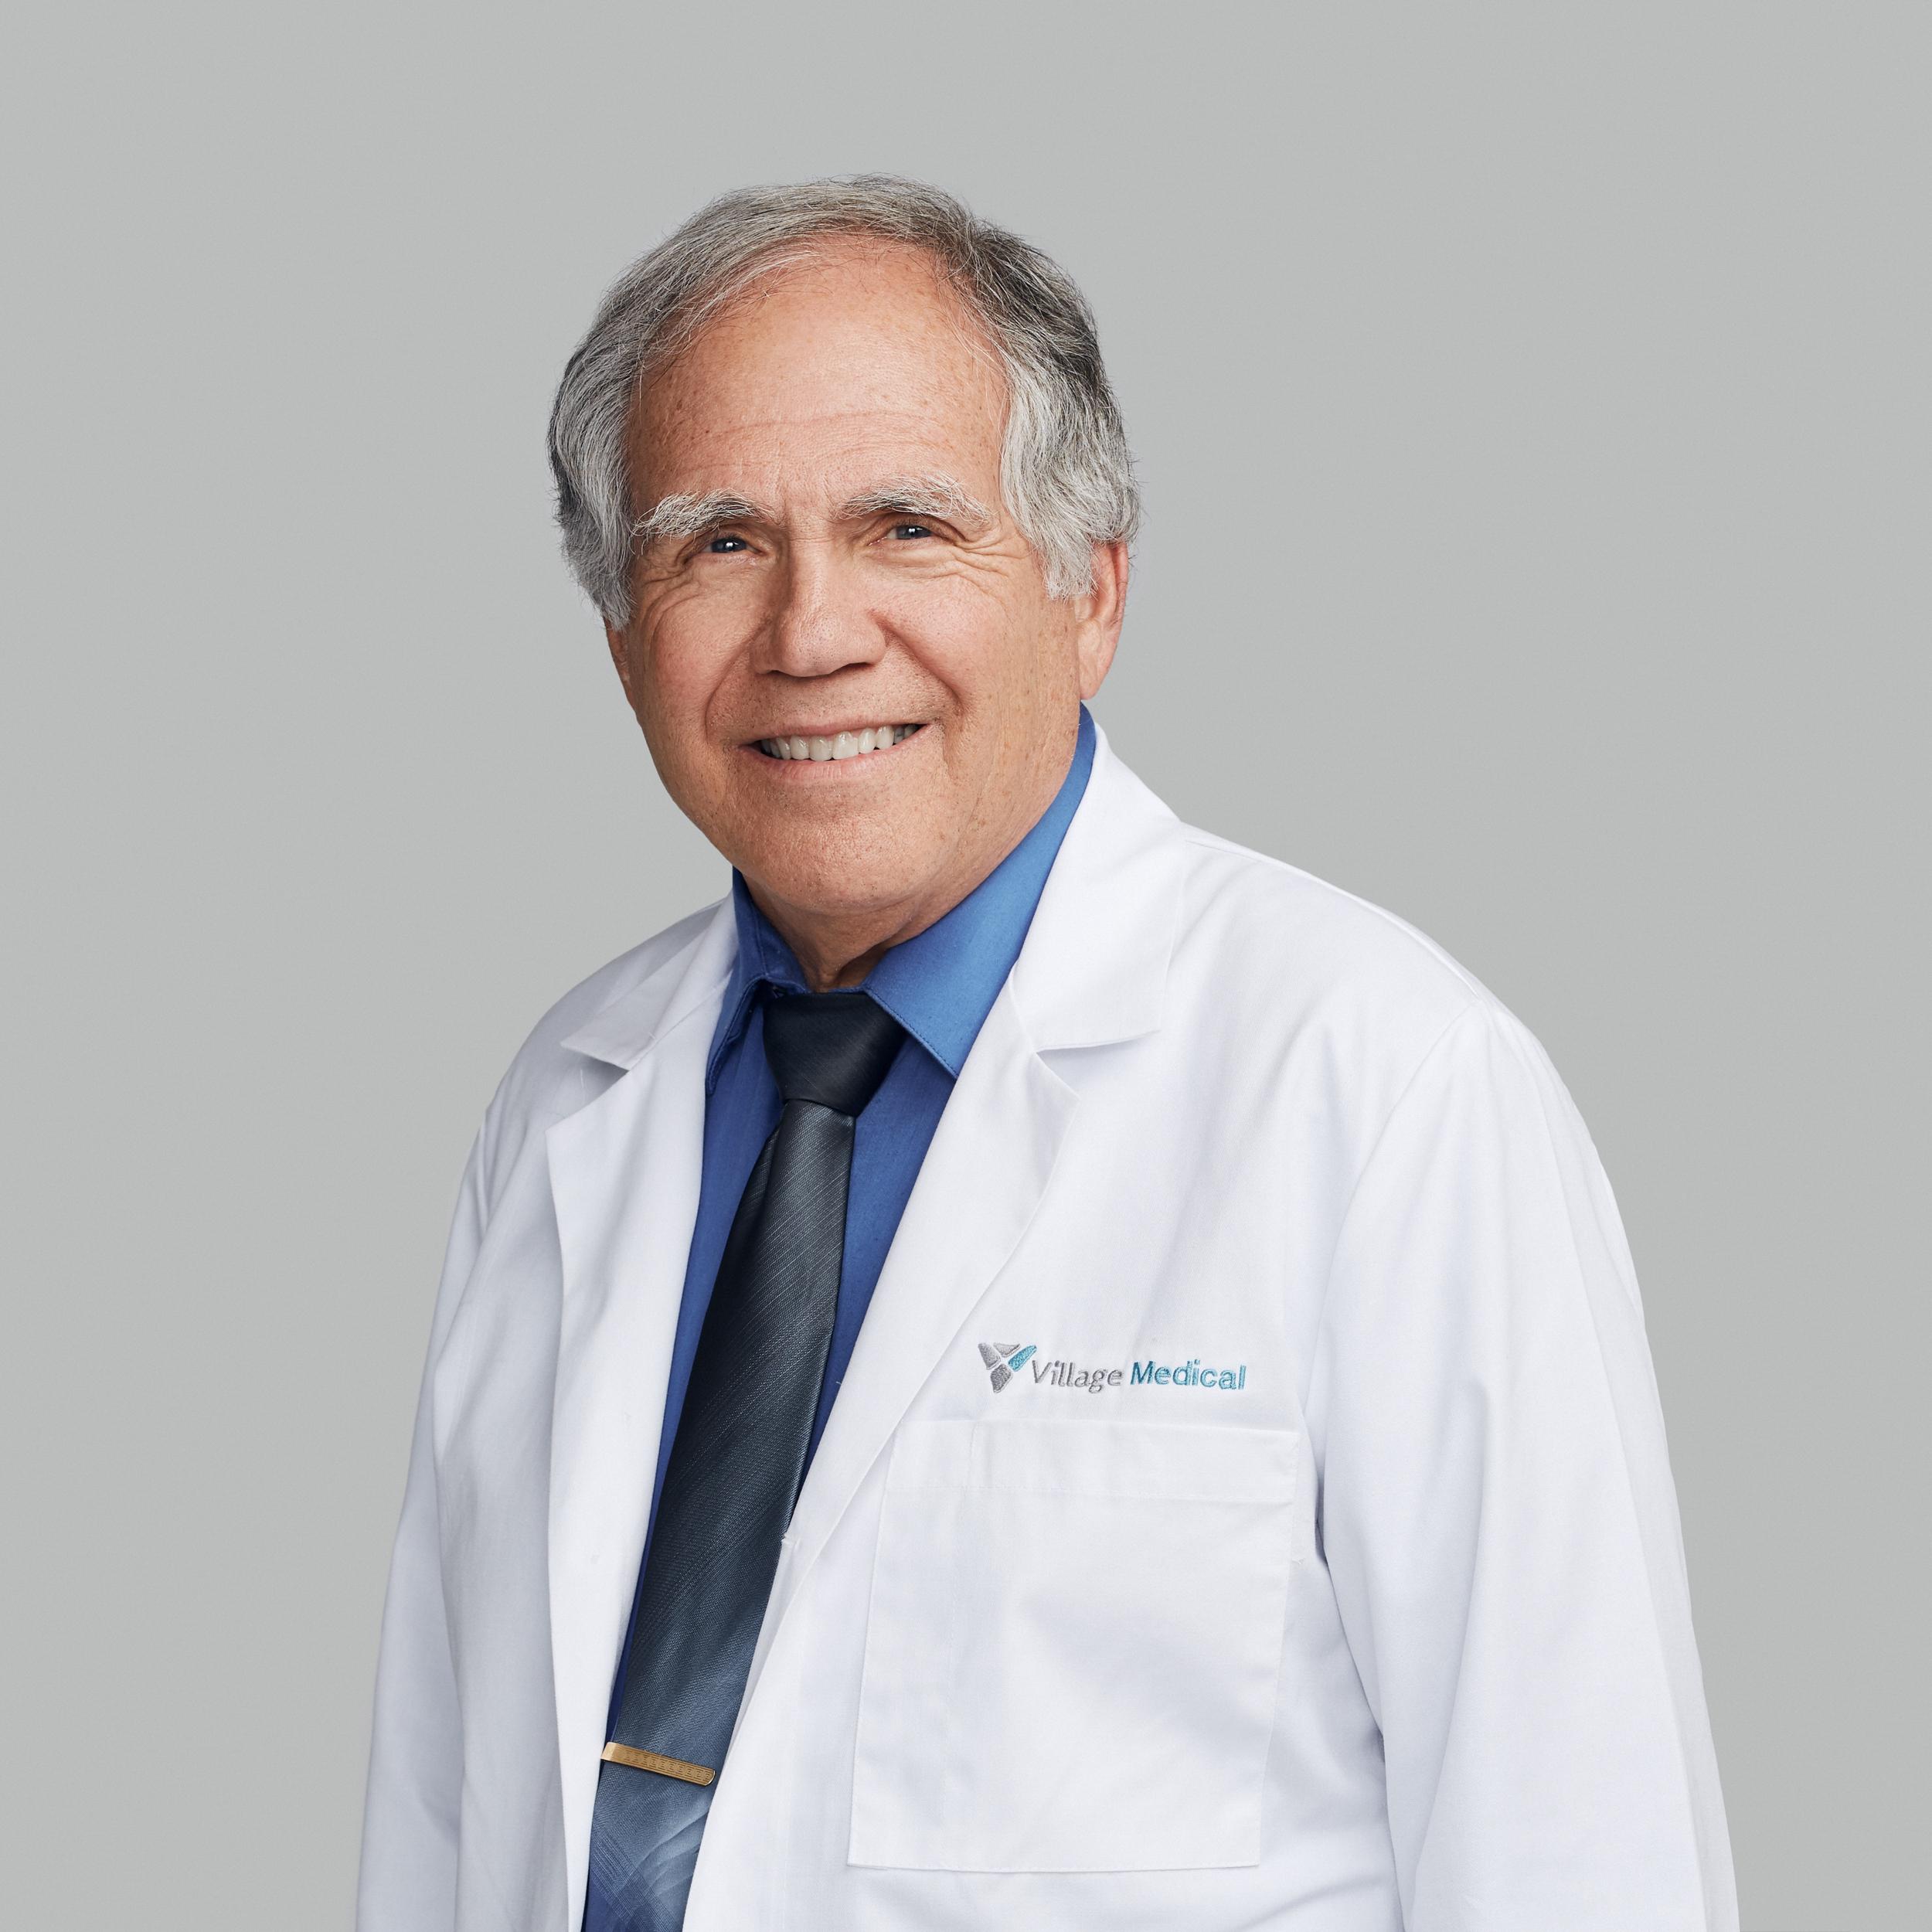 Bruce Herman, MD